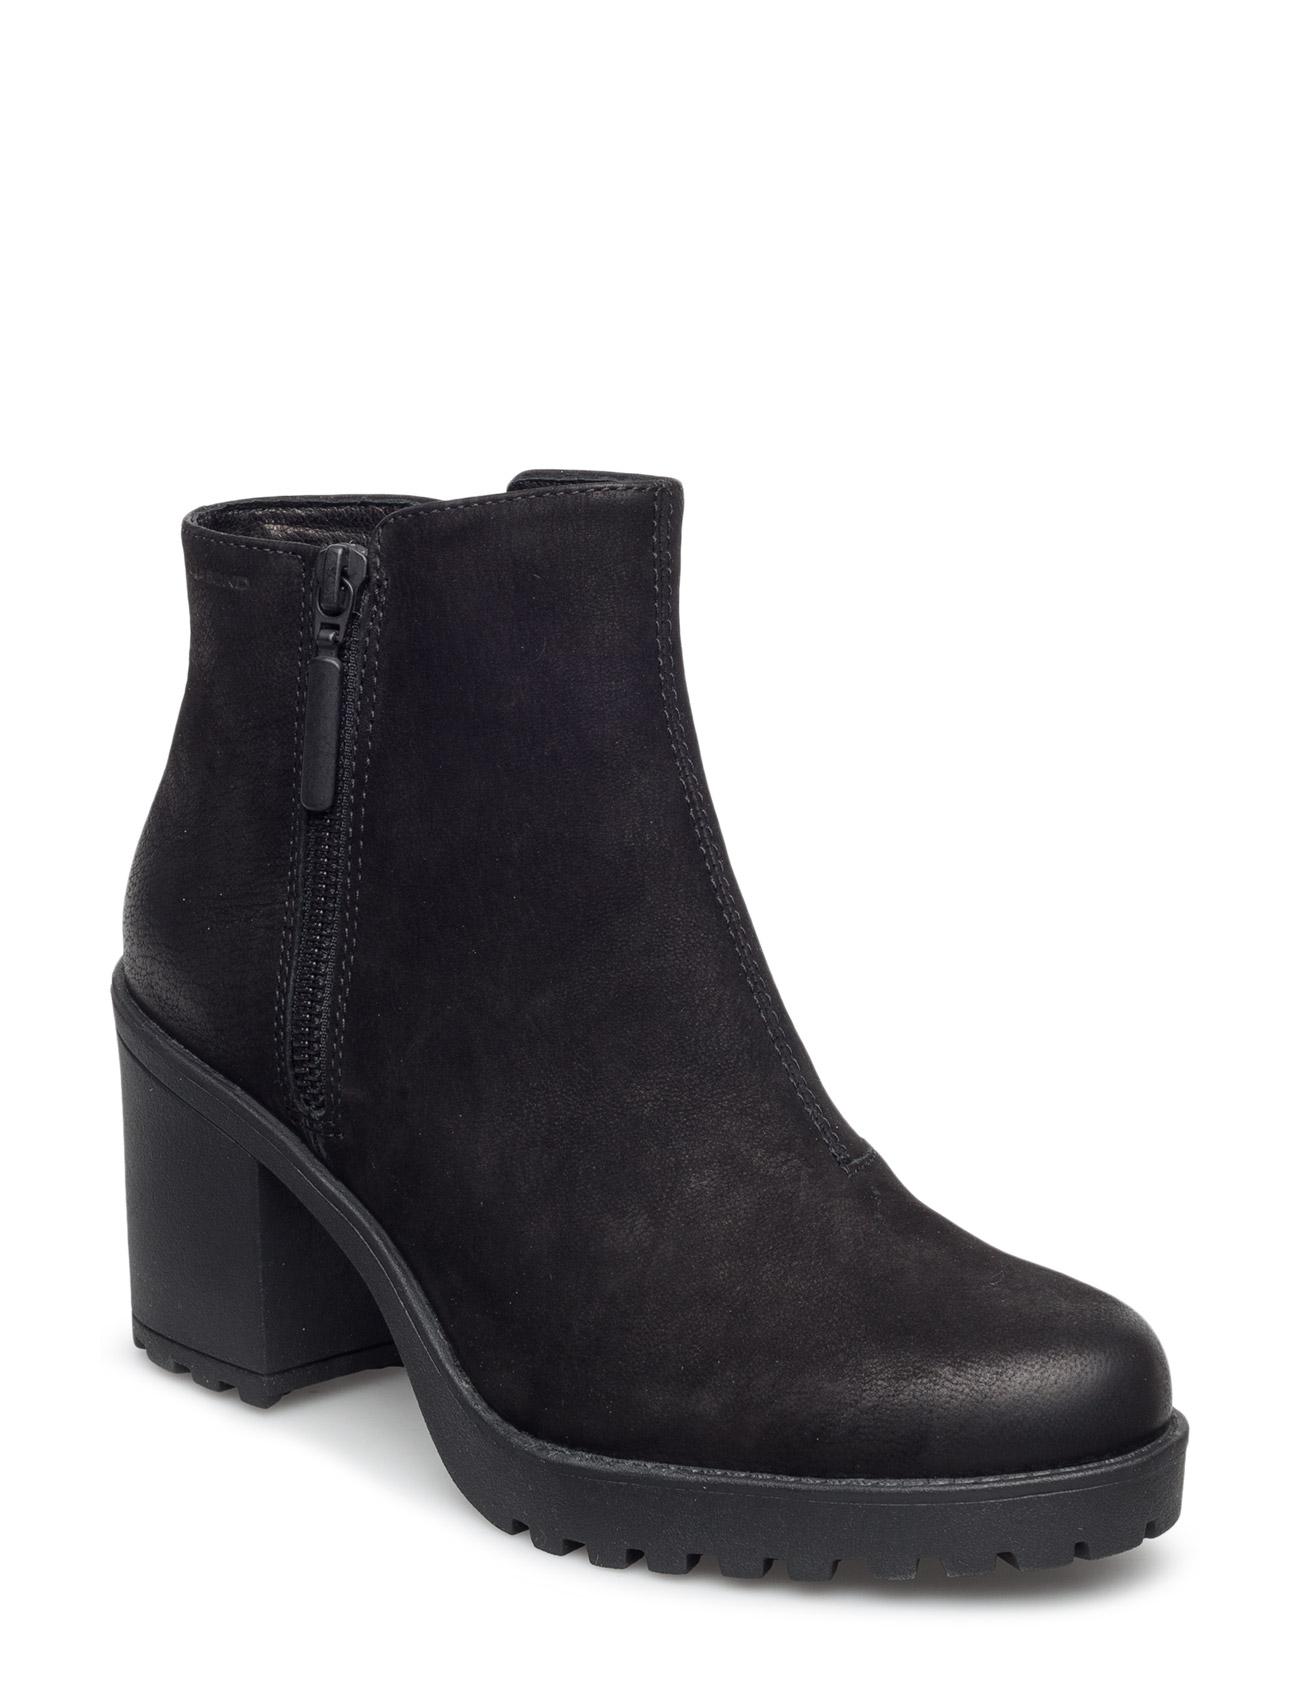 Grace VAGABOND Støvler til Damer i Sort